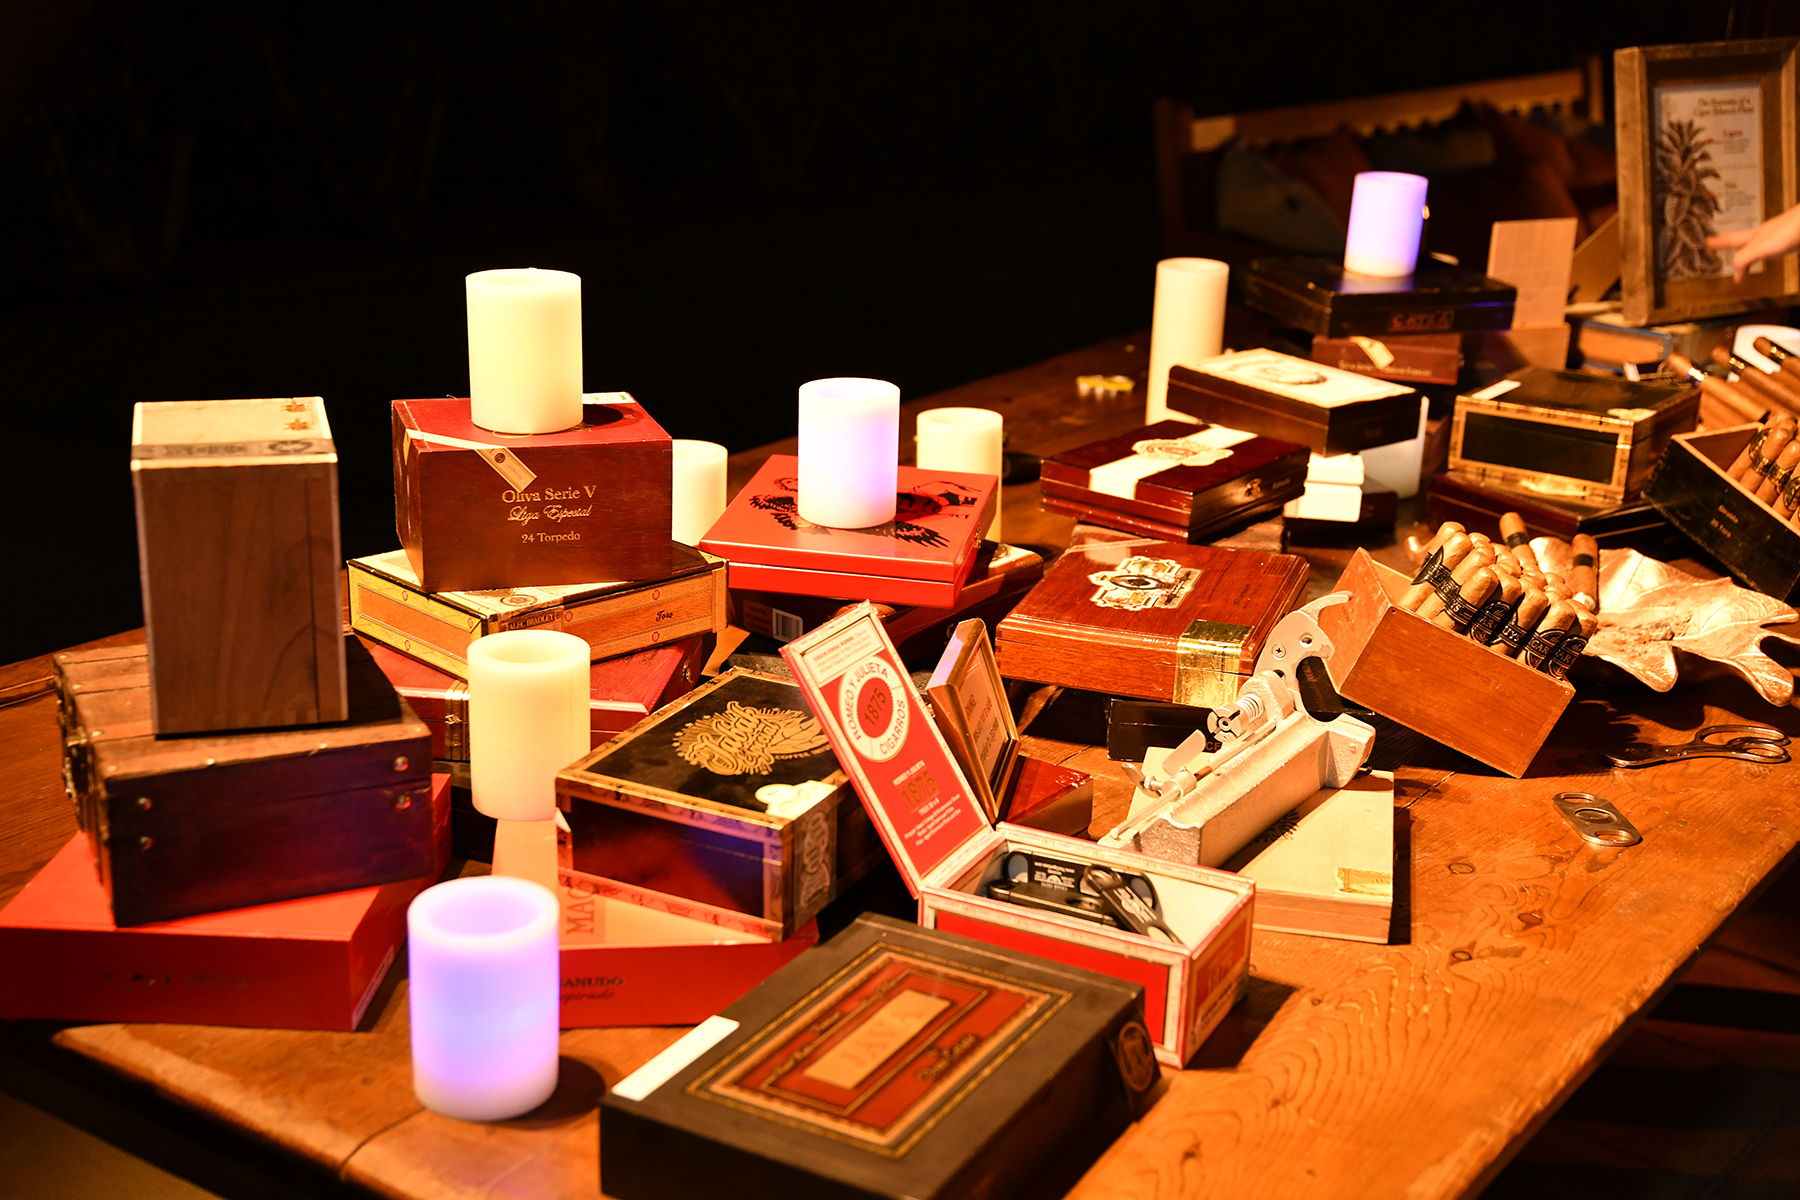 Toi Event Cigar Bar With Wax Luminaries